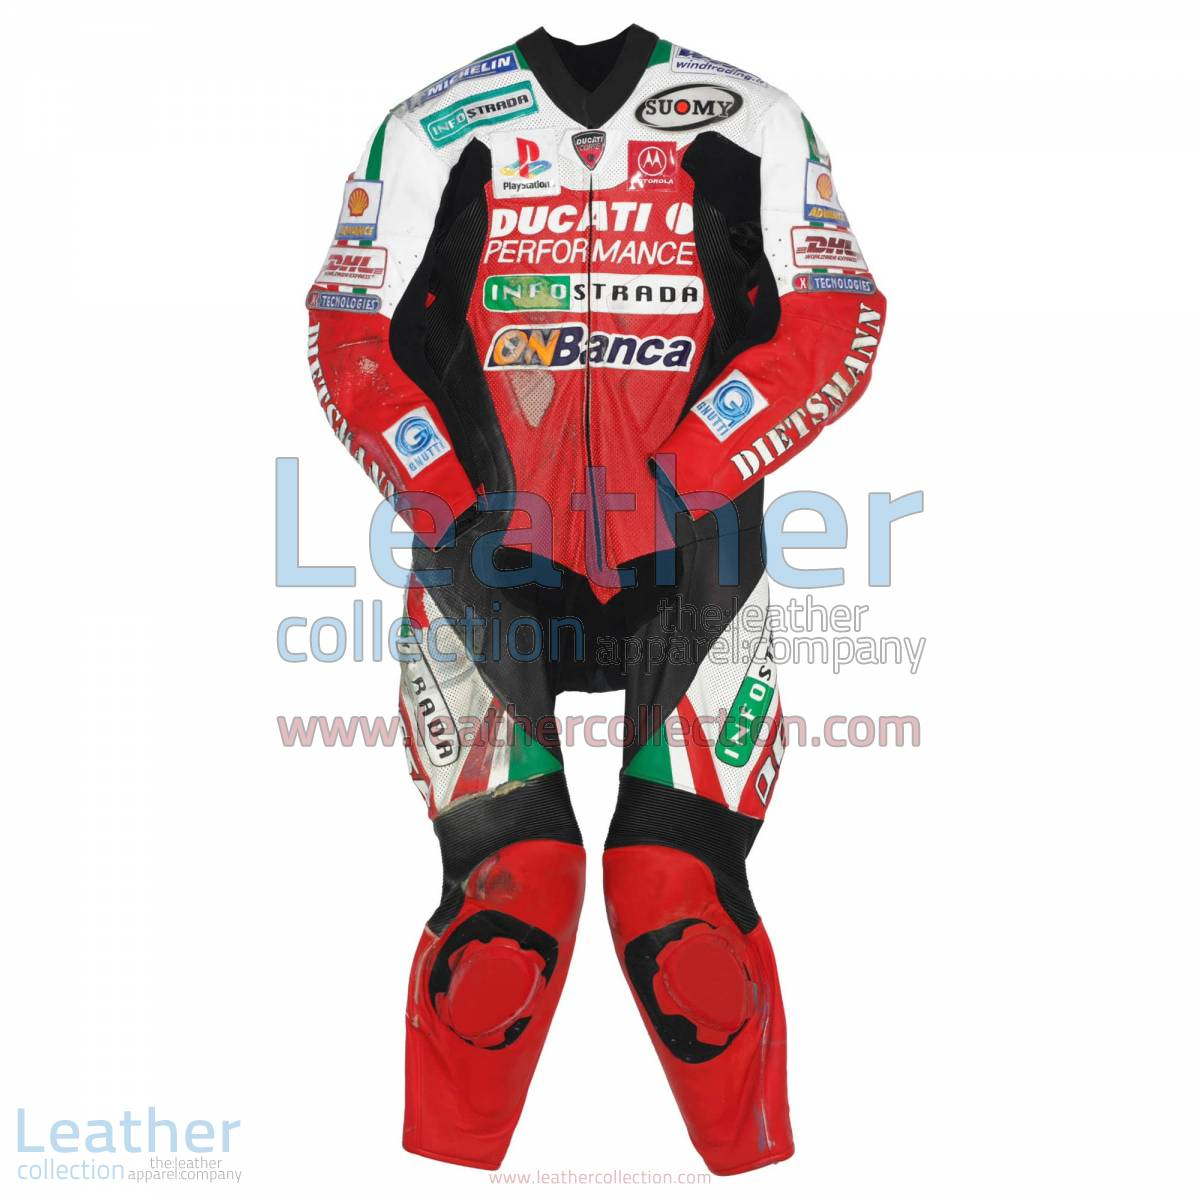 Troy Bayliss Ducati WSBK 2001 Leathers | ducati leathers